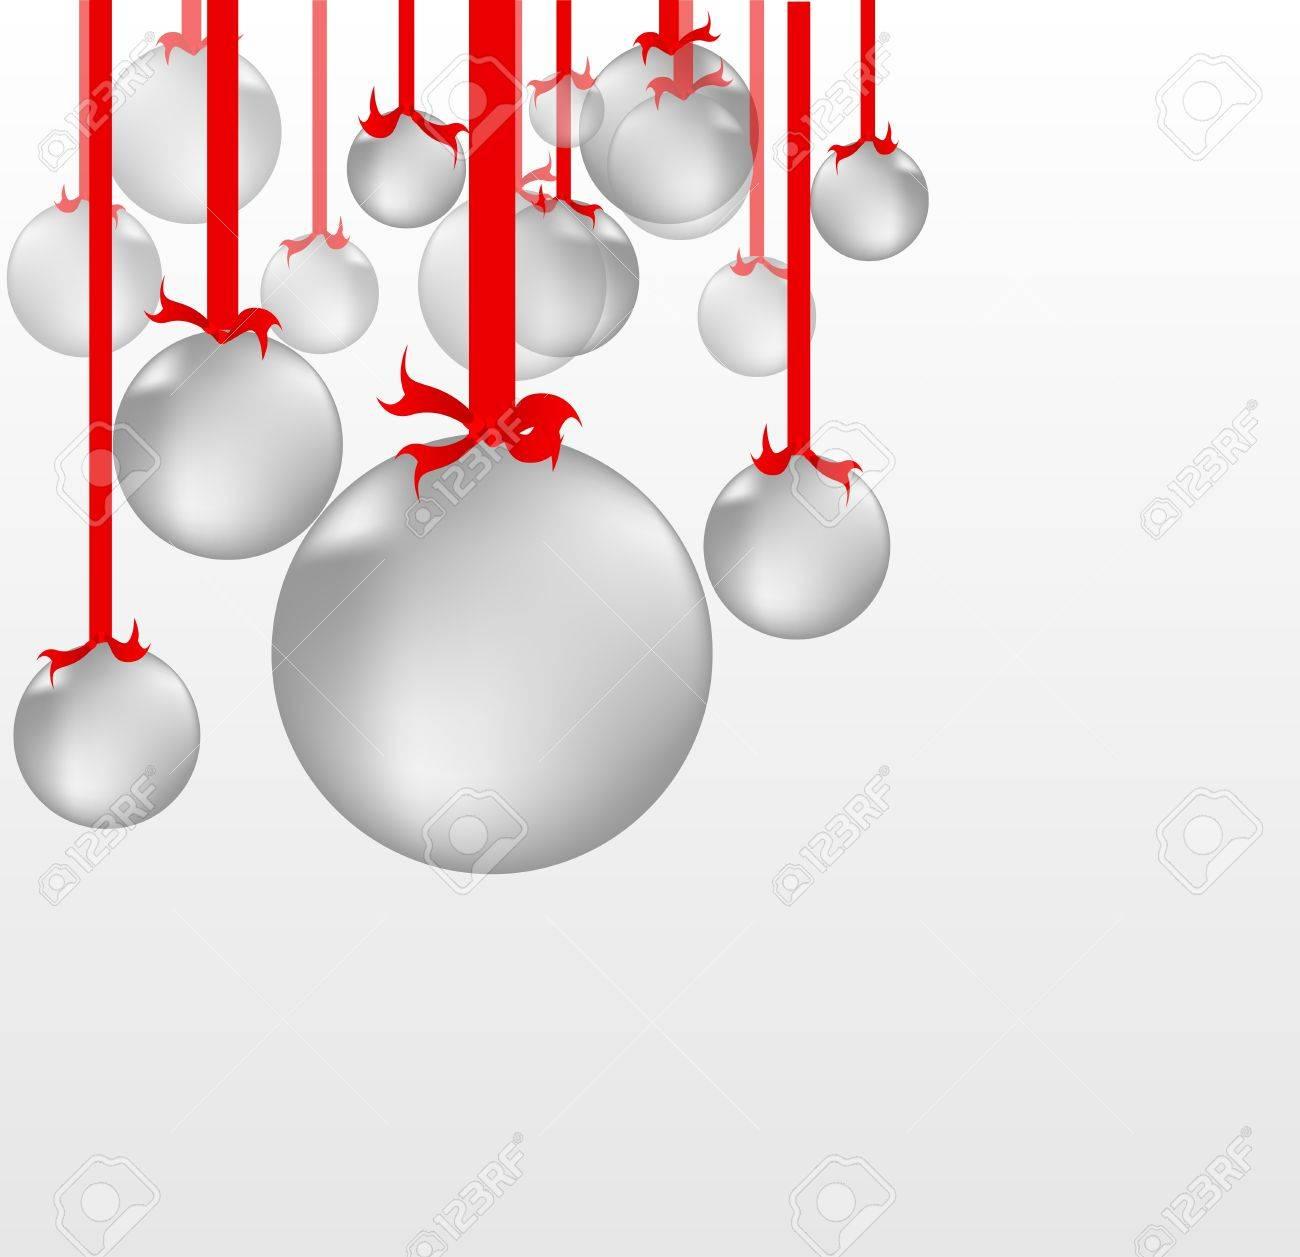 Christmas Background Illustration Stock Vector - 15845931